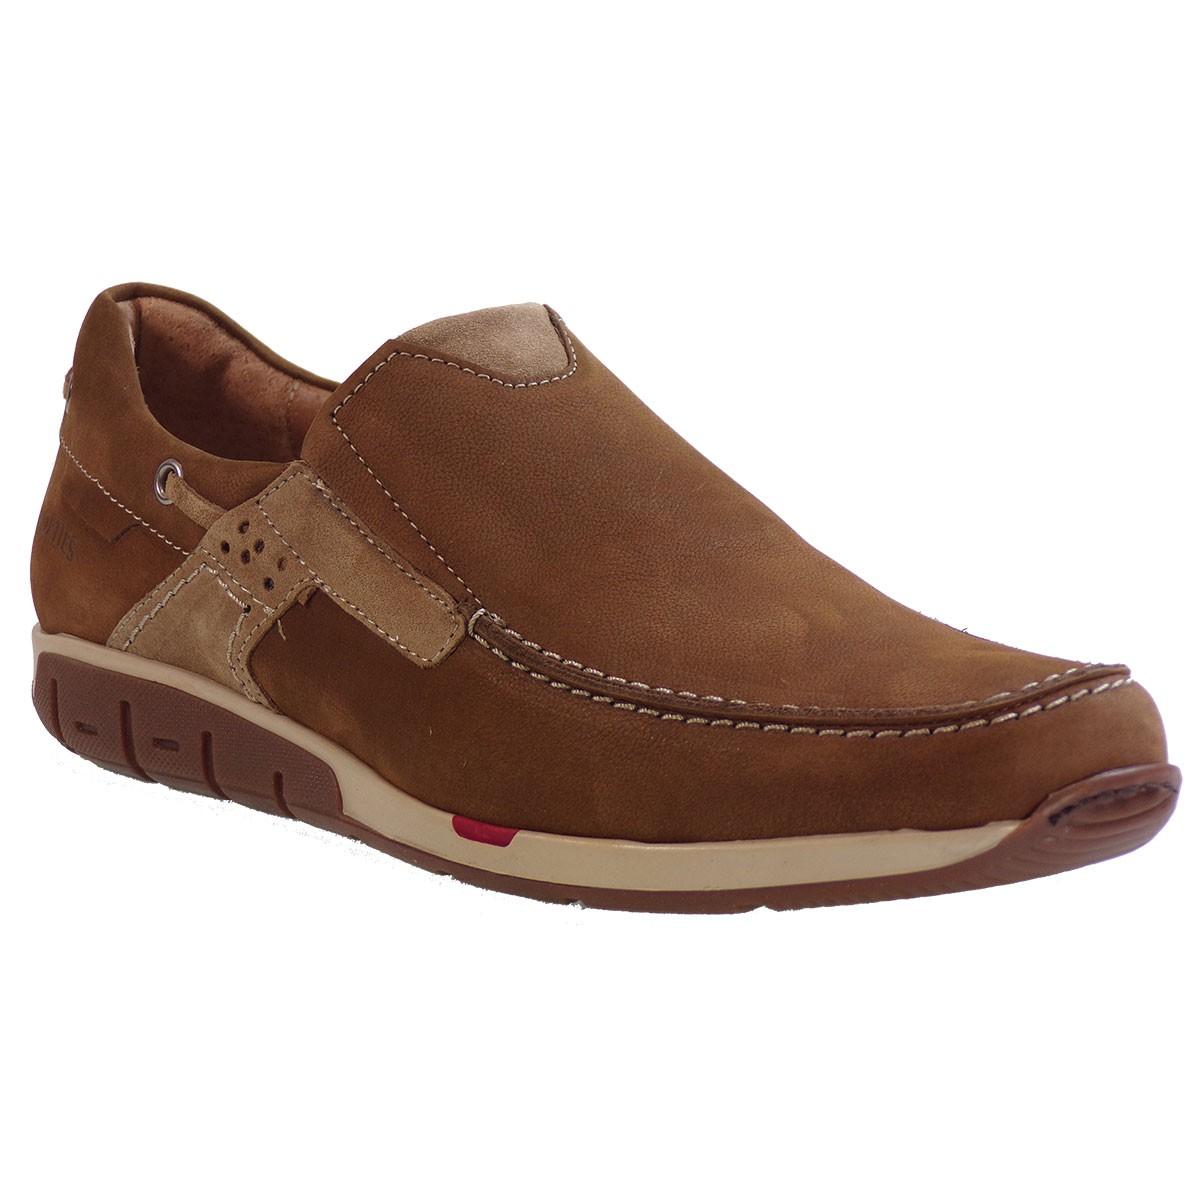 10dc73063fc Softies Ανδρικά Παπούτσια 6966 Ταμπά Δέρμα Καστόρι